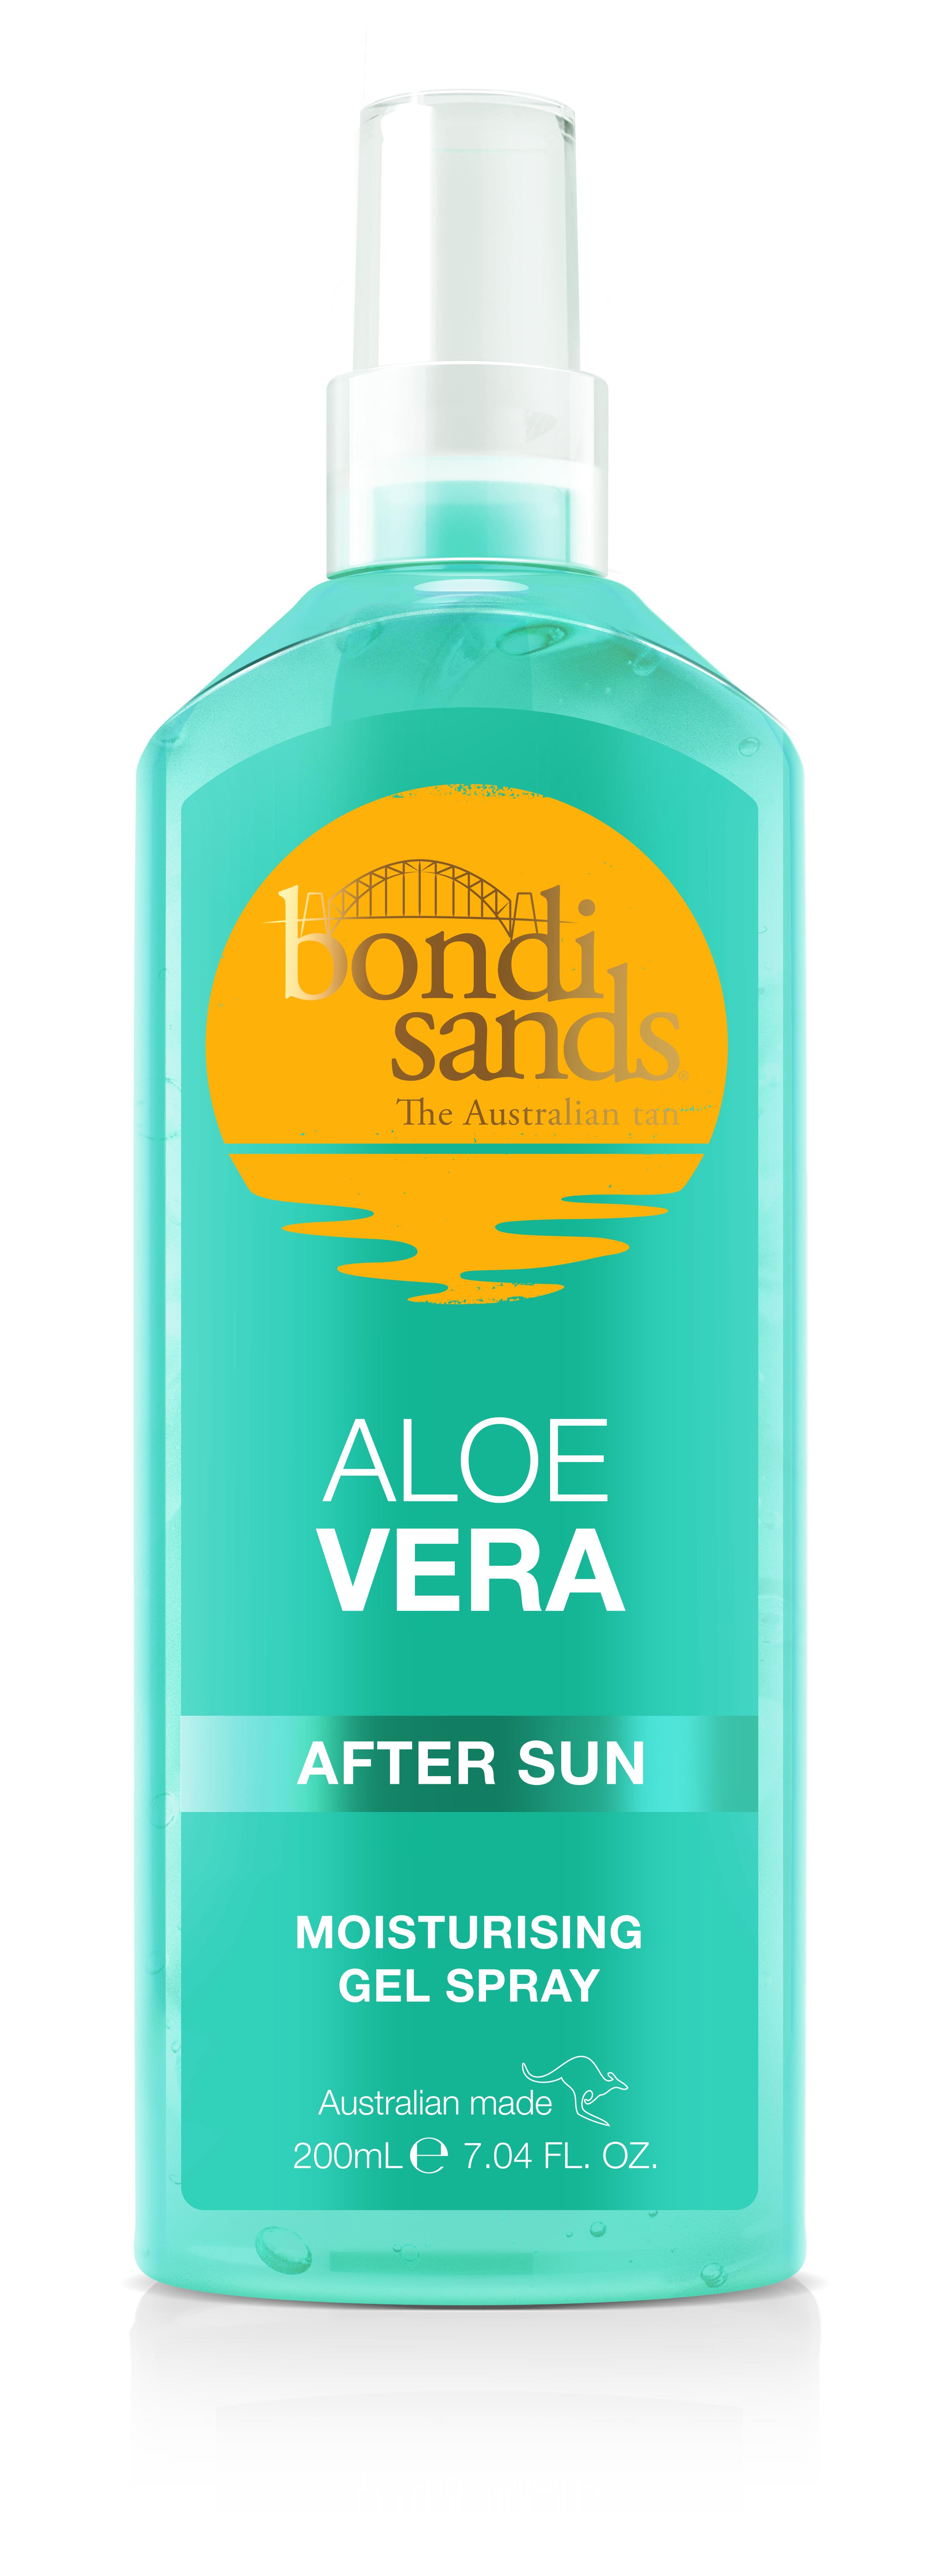 Bondi Sands Aloe Vera After Sun Moisturing Gel Spray, RRP$14.99